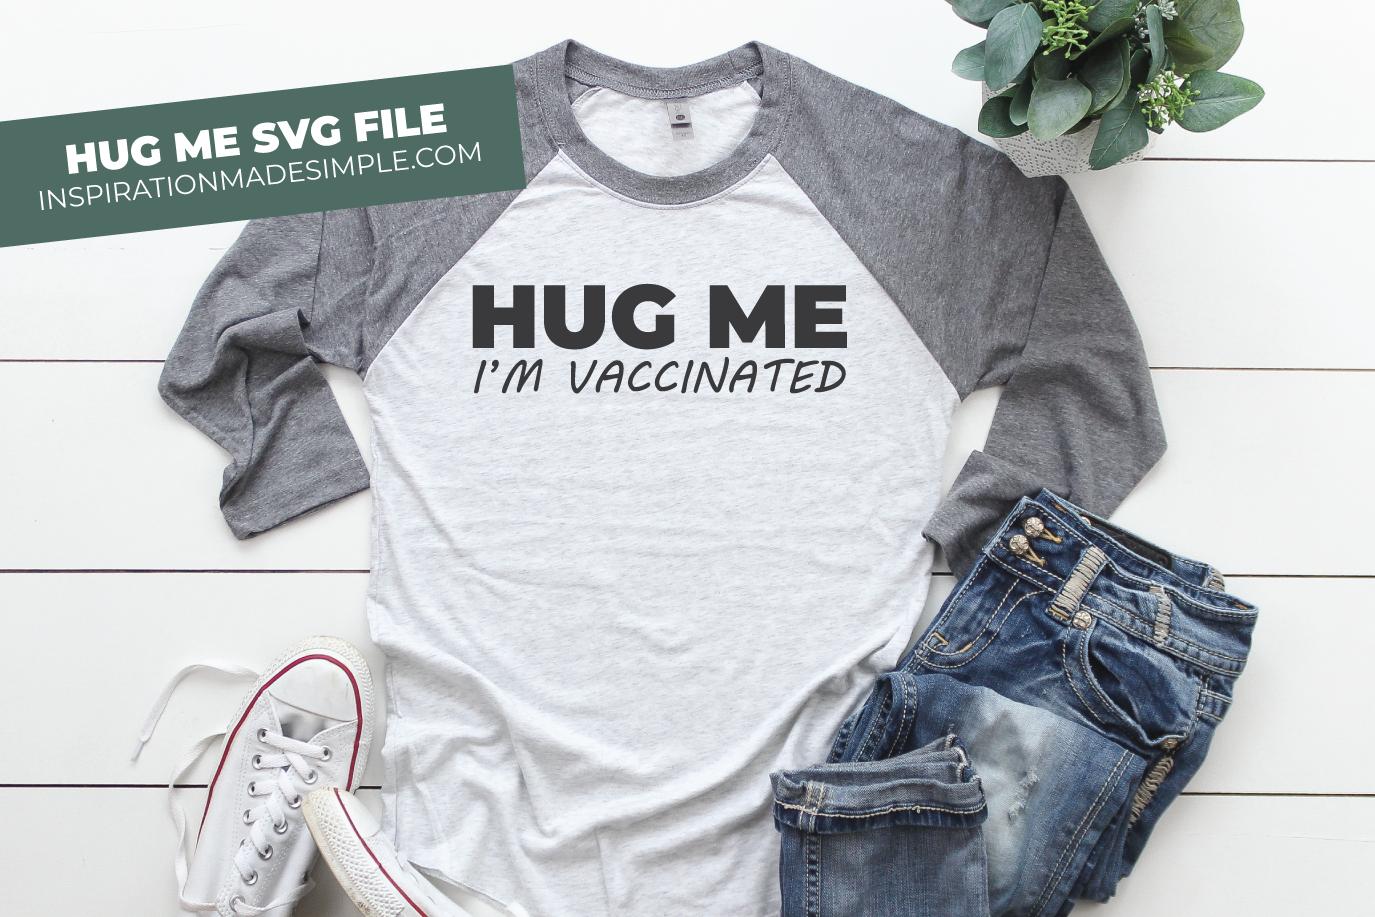 DIY Hug Me I'm Vaccinated Shirt